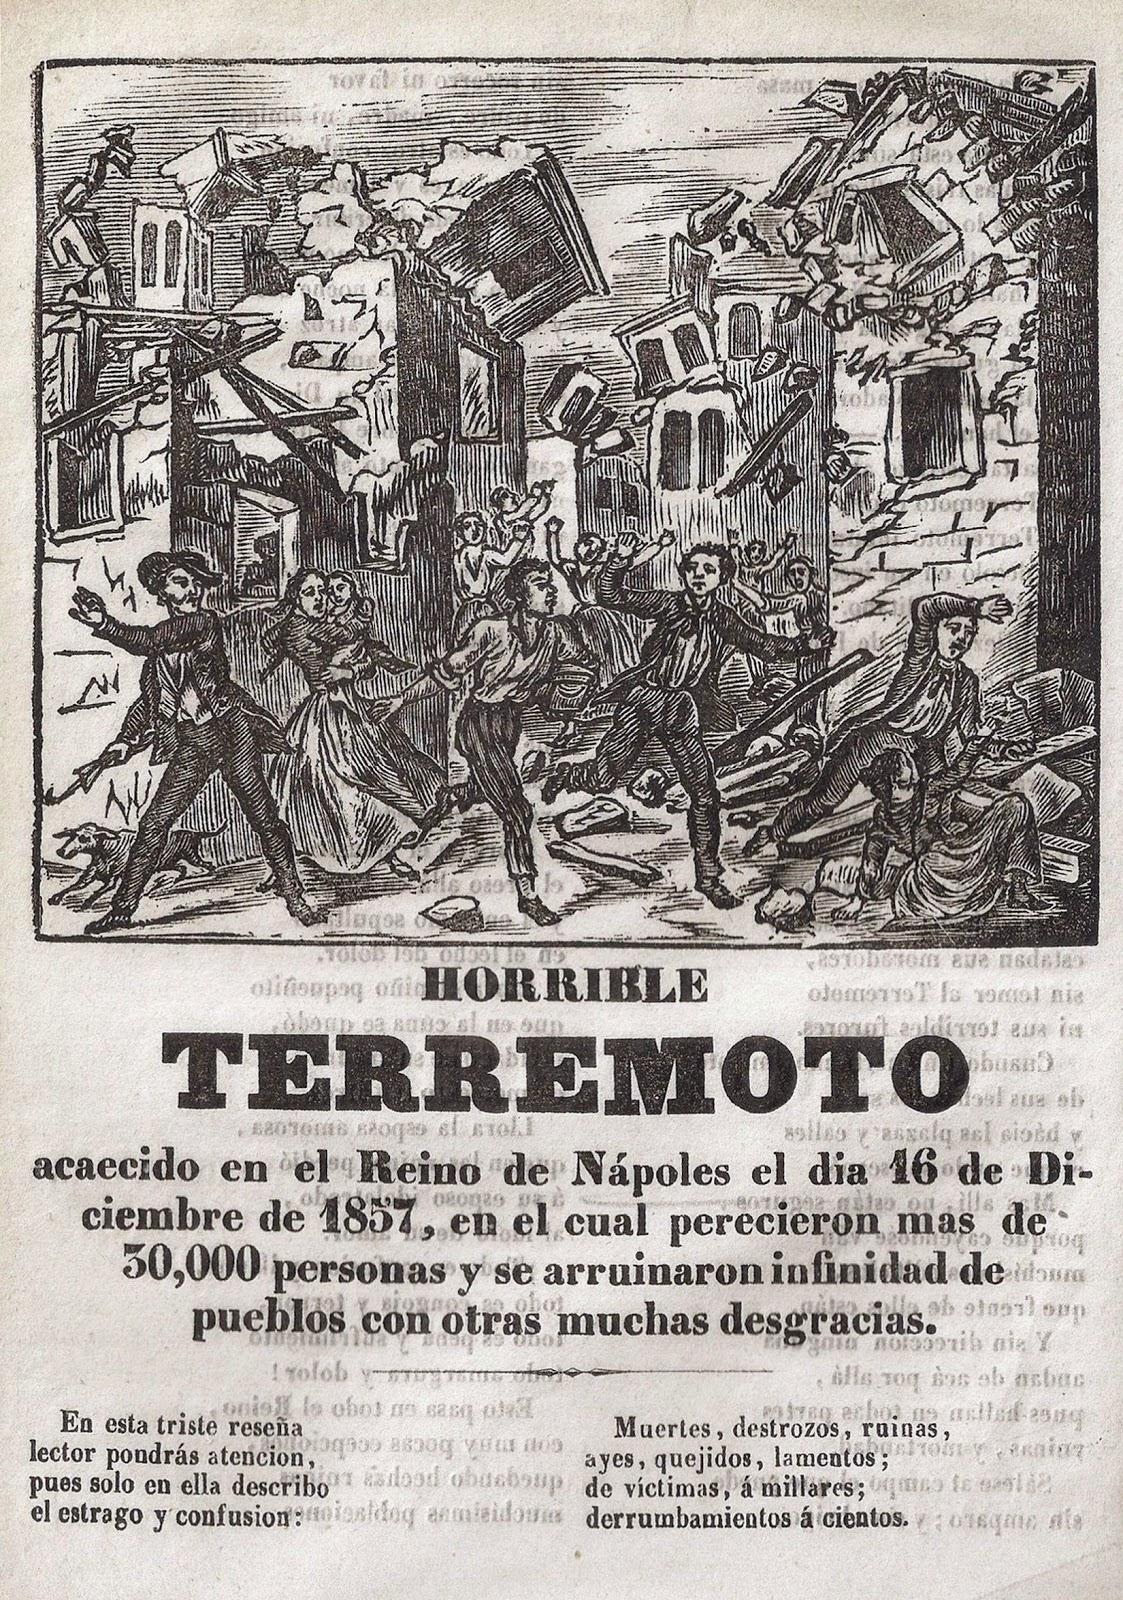 Horrible terremoto en Nápoles. Barcelona, Impr. José Tauló, 1858